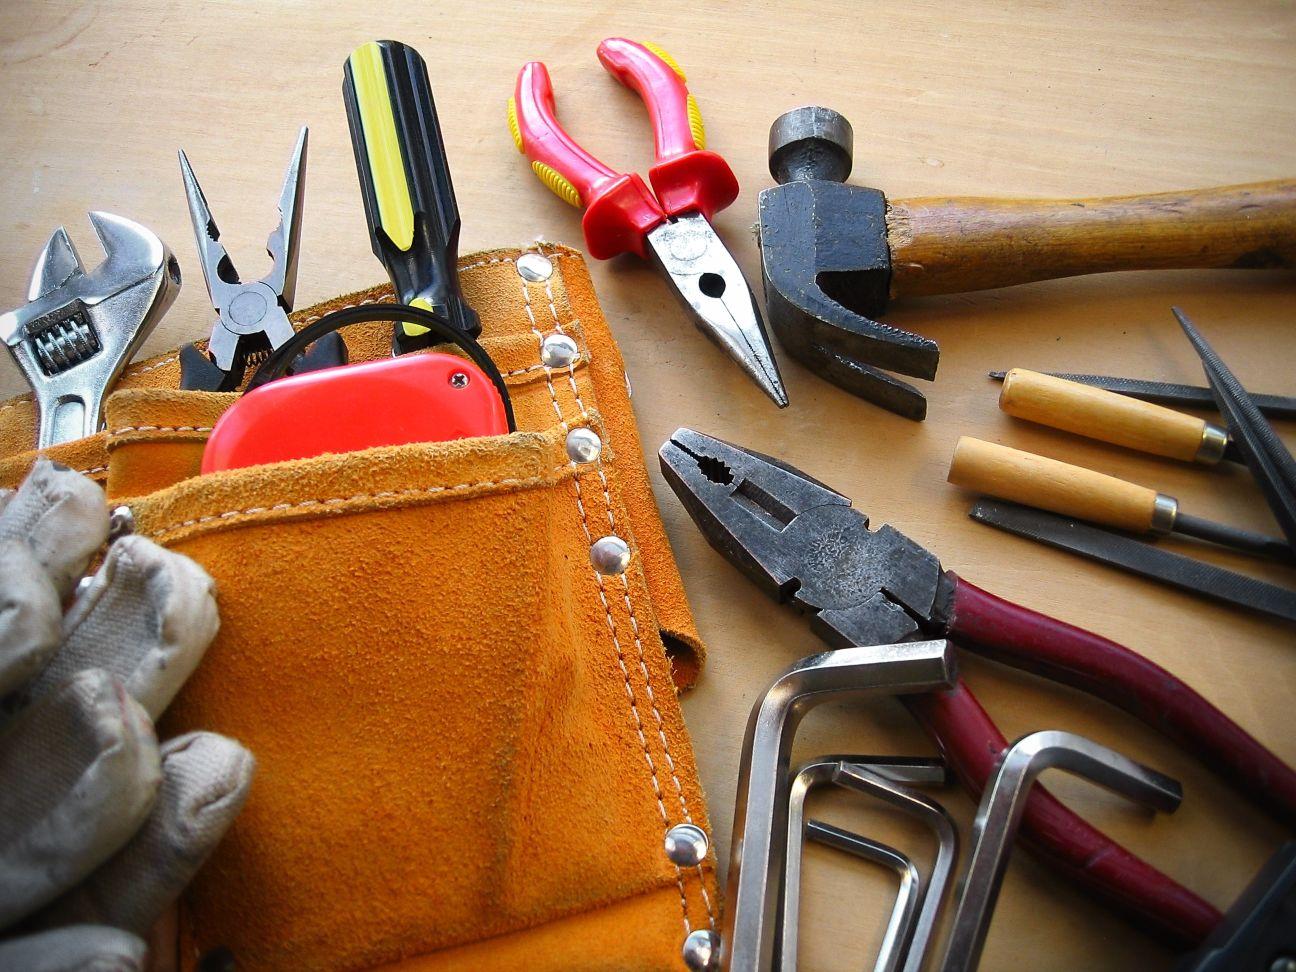 Tools - Hand